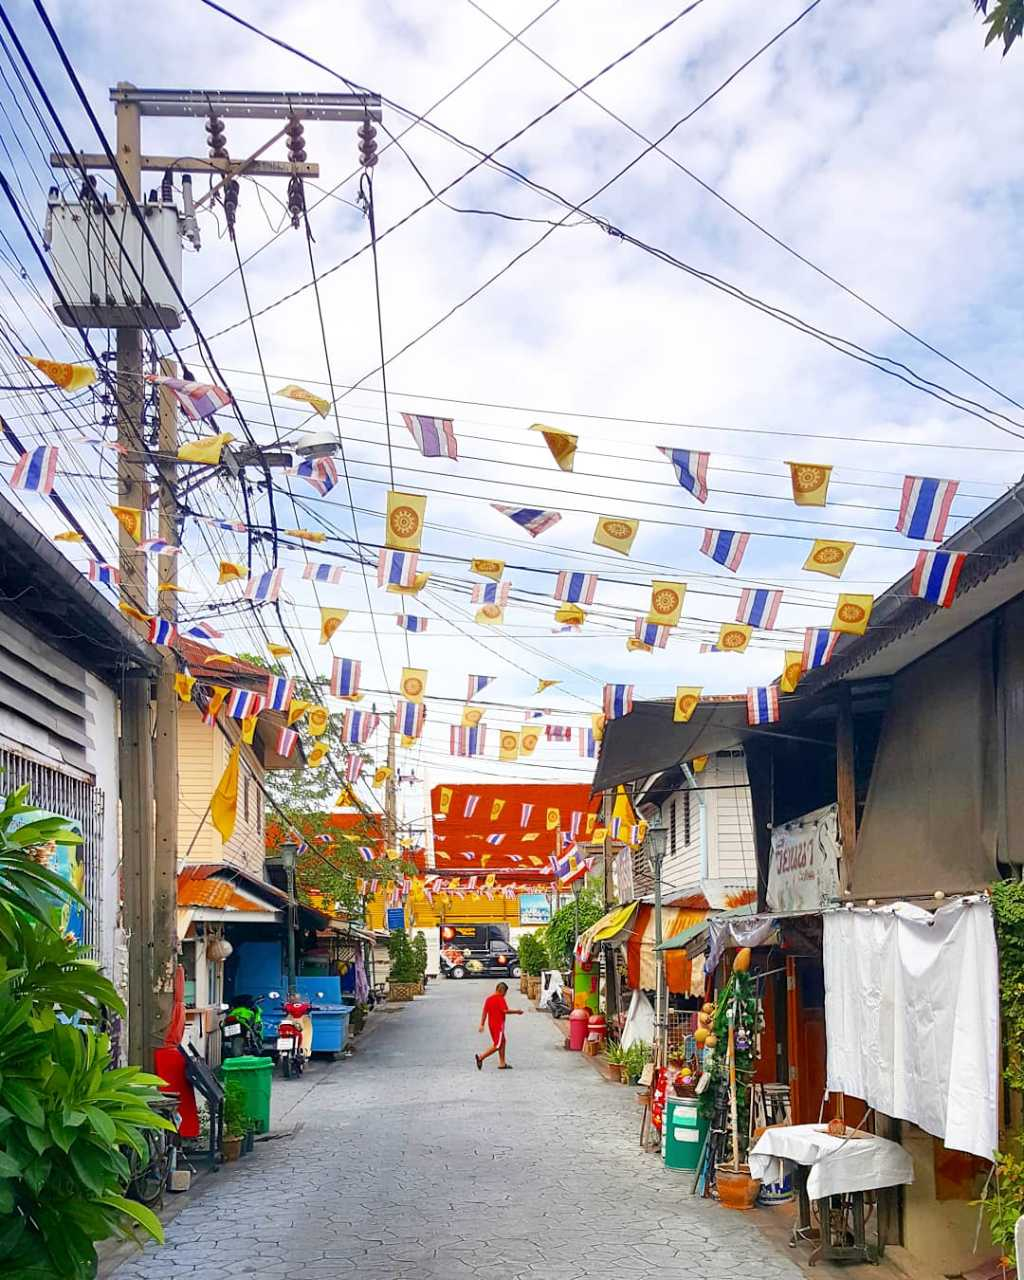 Een soi (straatje) in Bangkok